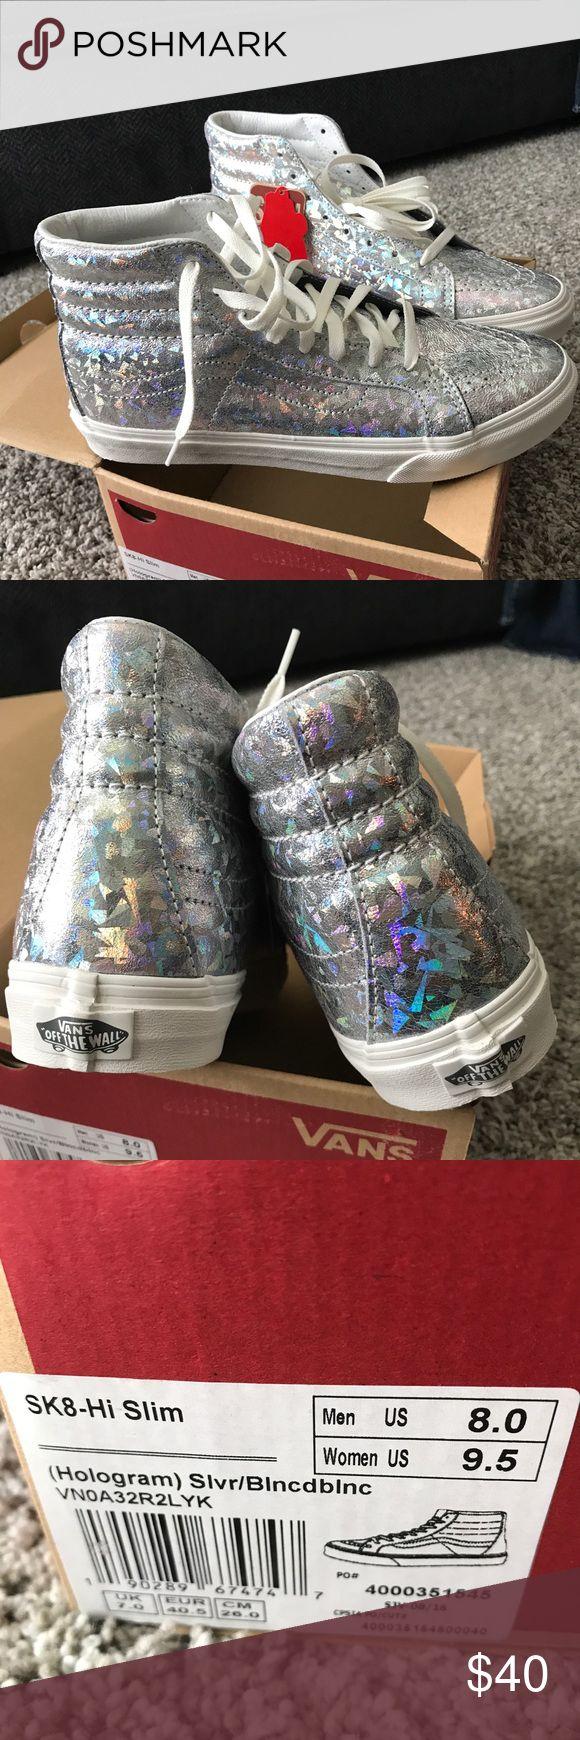 Brand new VANS!!! Brand new van sk8-hi slim sz 9.5 women's 8 men's. Hologram color very nice Vans Shoes Athletic Shoes